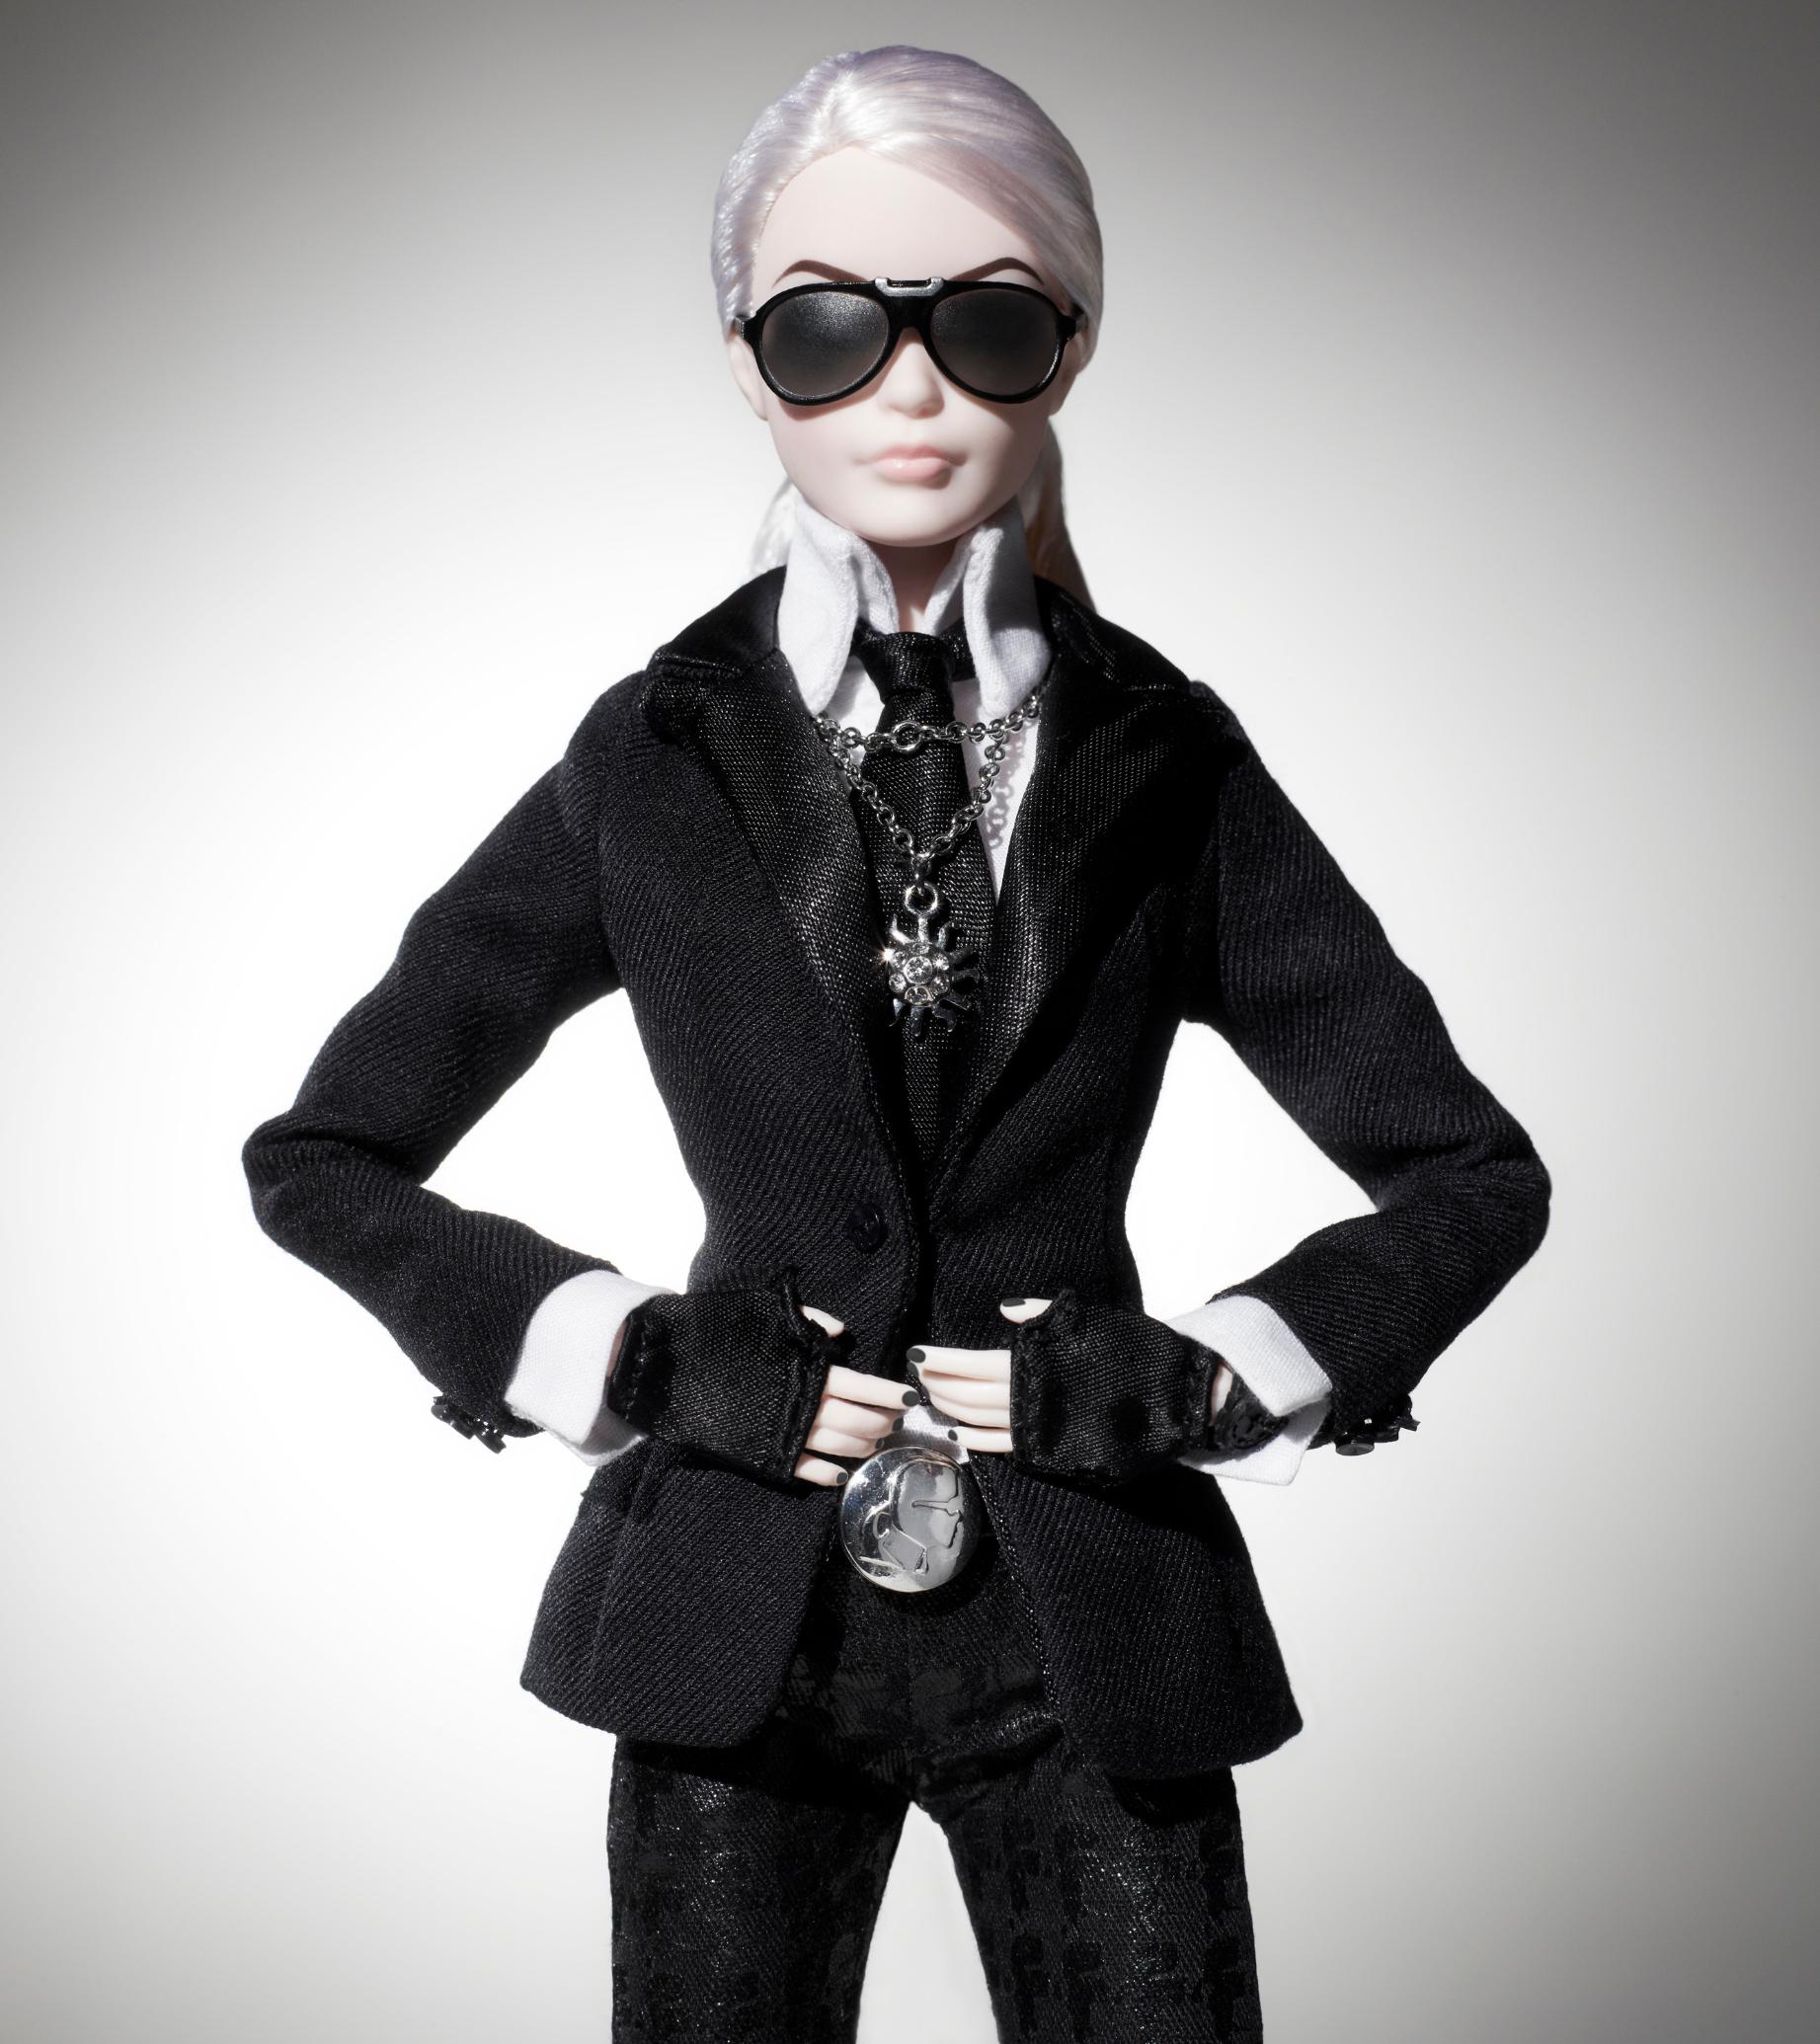 The Karl Lagerfeld Barbie Doll, released in 2014.